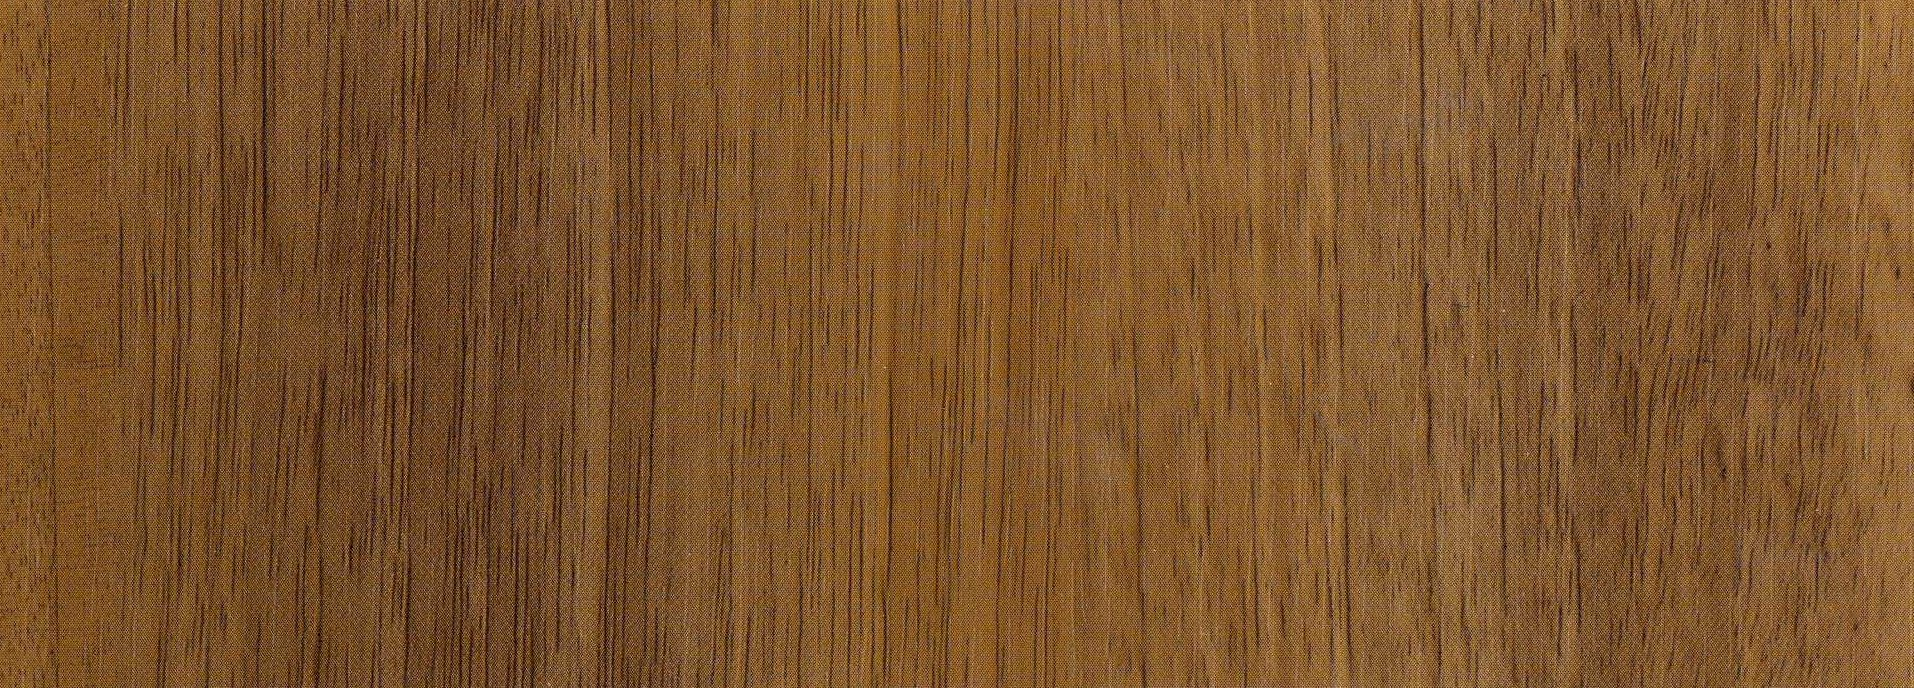 Plakfolie Noten 3885 - 45cm x 2m